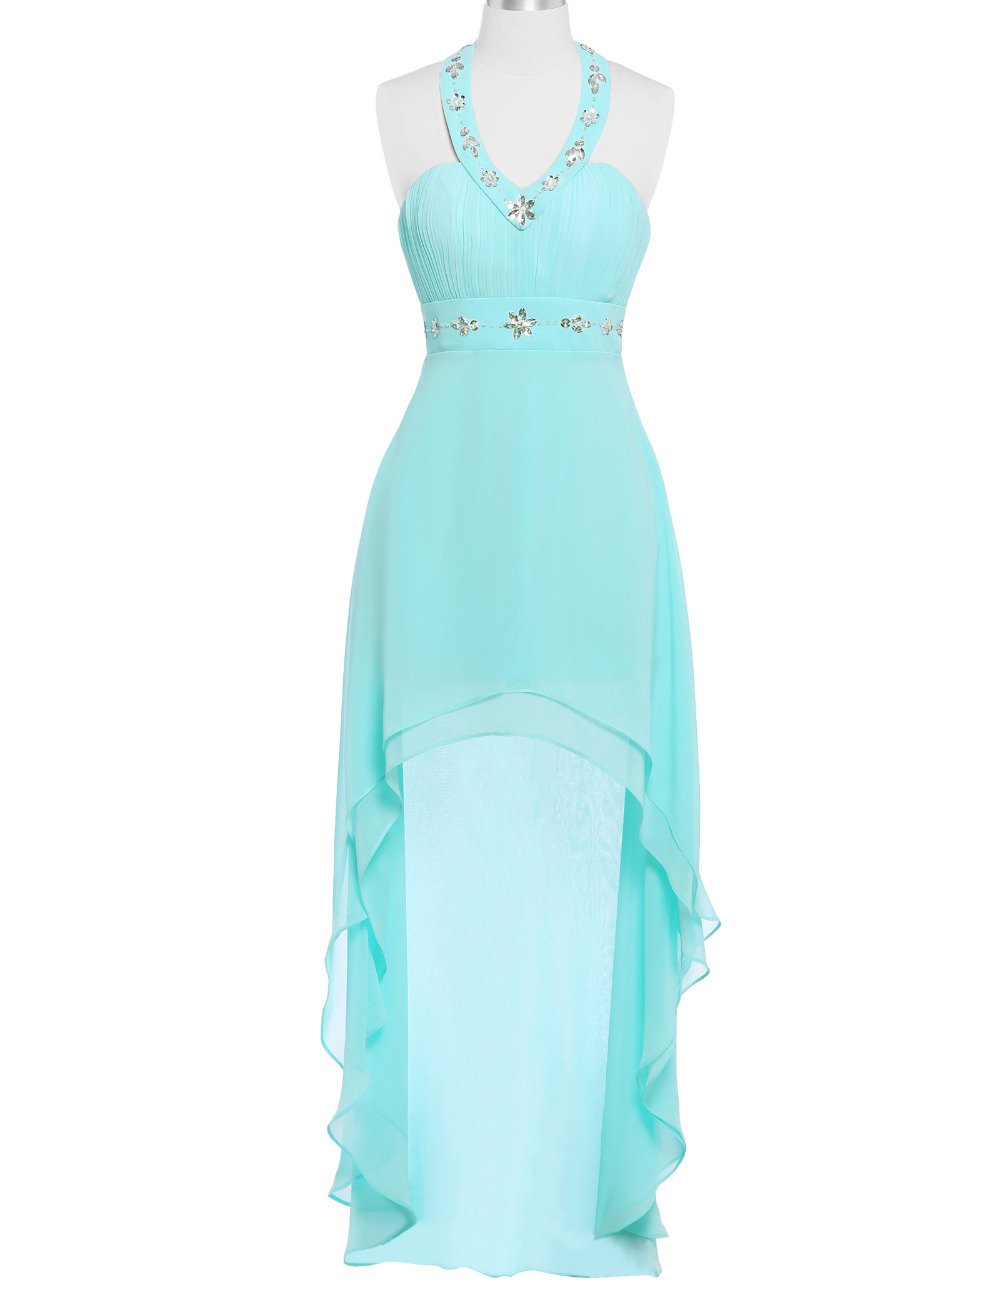 Black Bridesmaid Dresses Under 50 - Ocodea.com